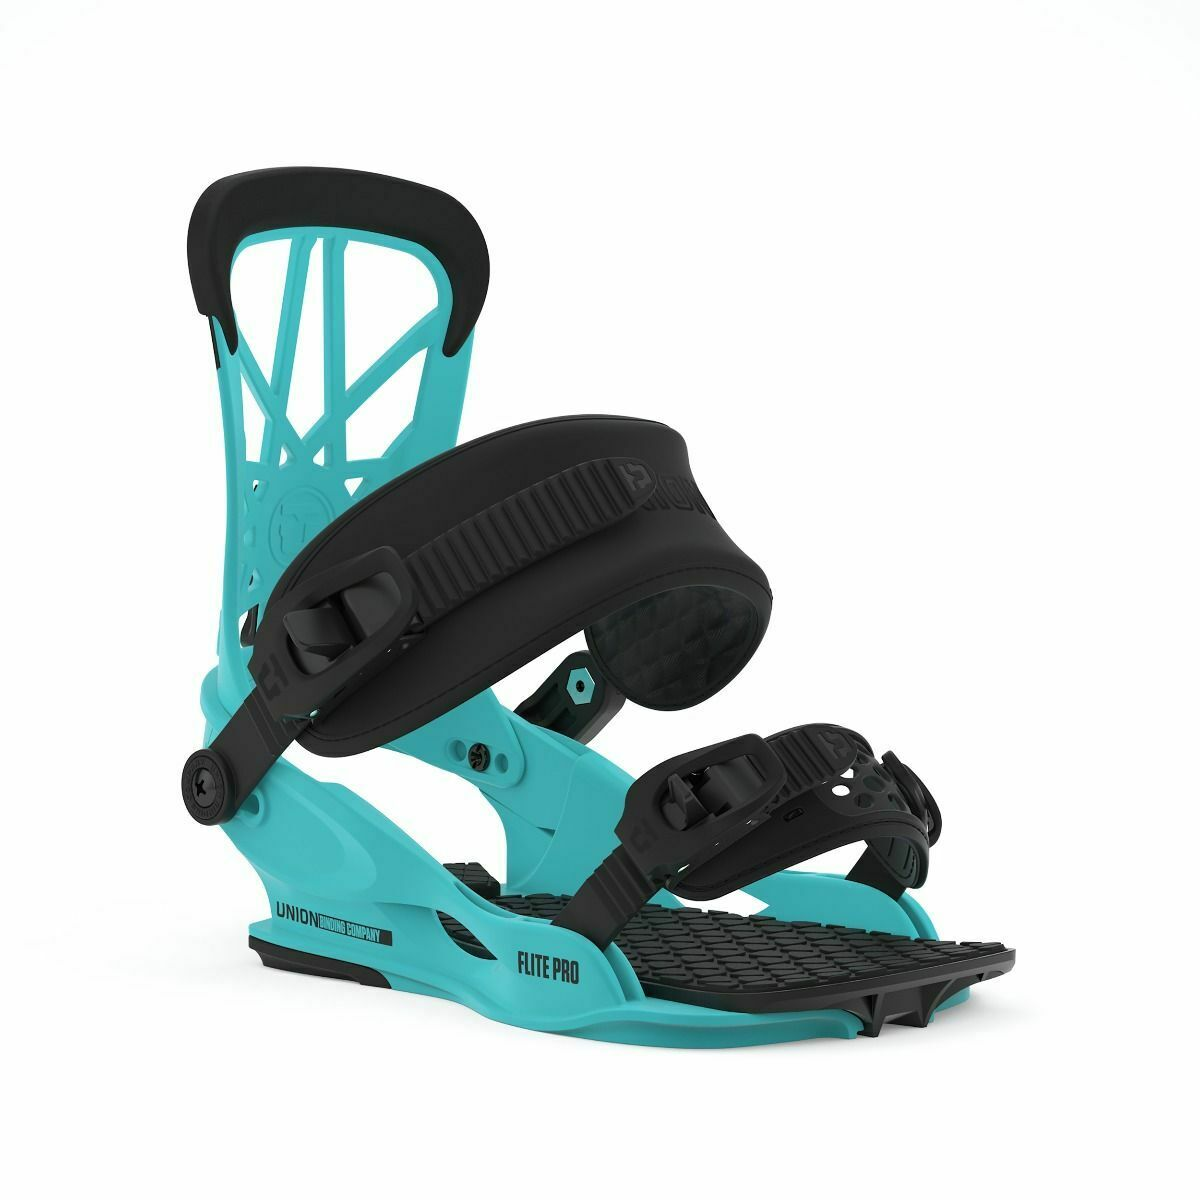 UNION FLITE PRO SNOWBOARD BINDINGS - VARIOUS - 2020